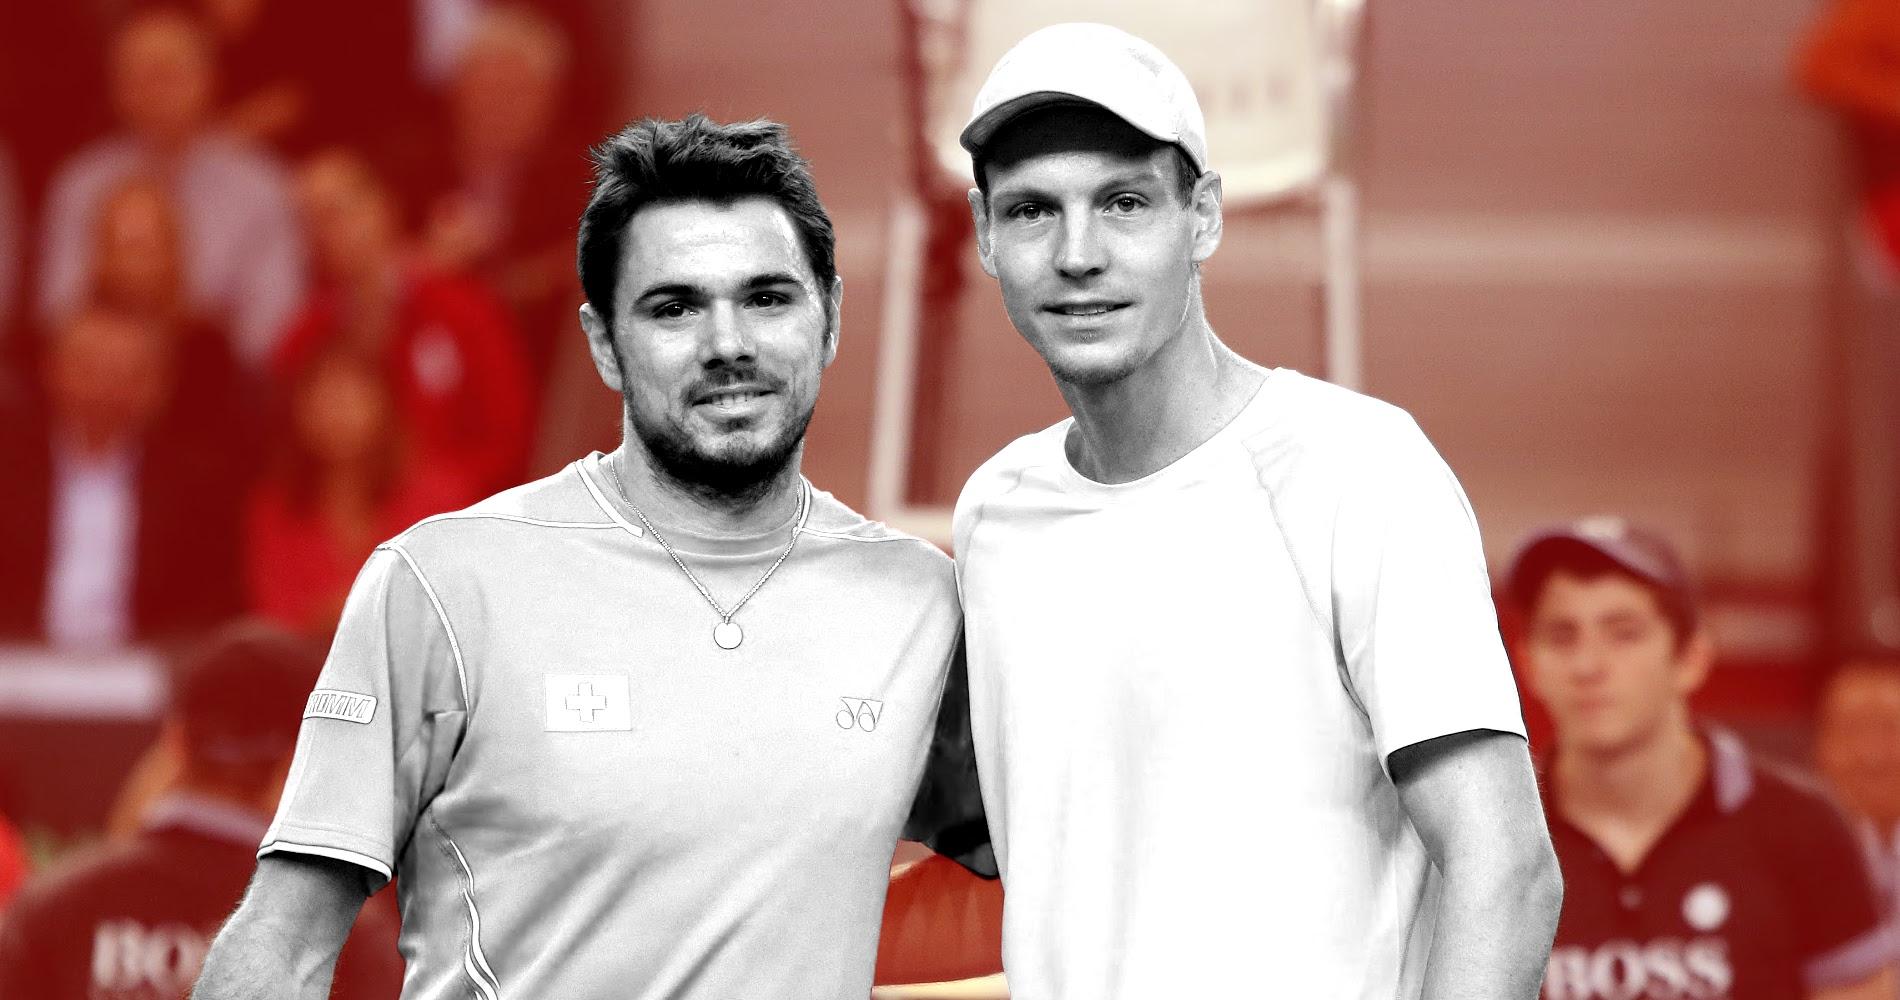 Berdych and Wawrinka